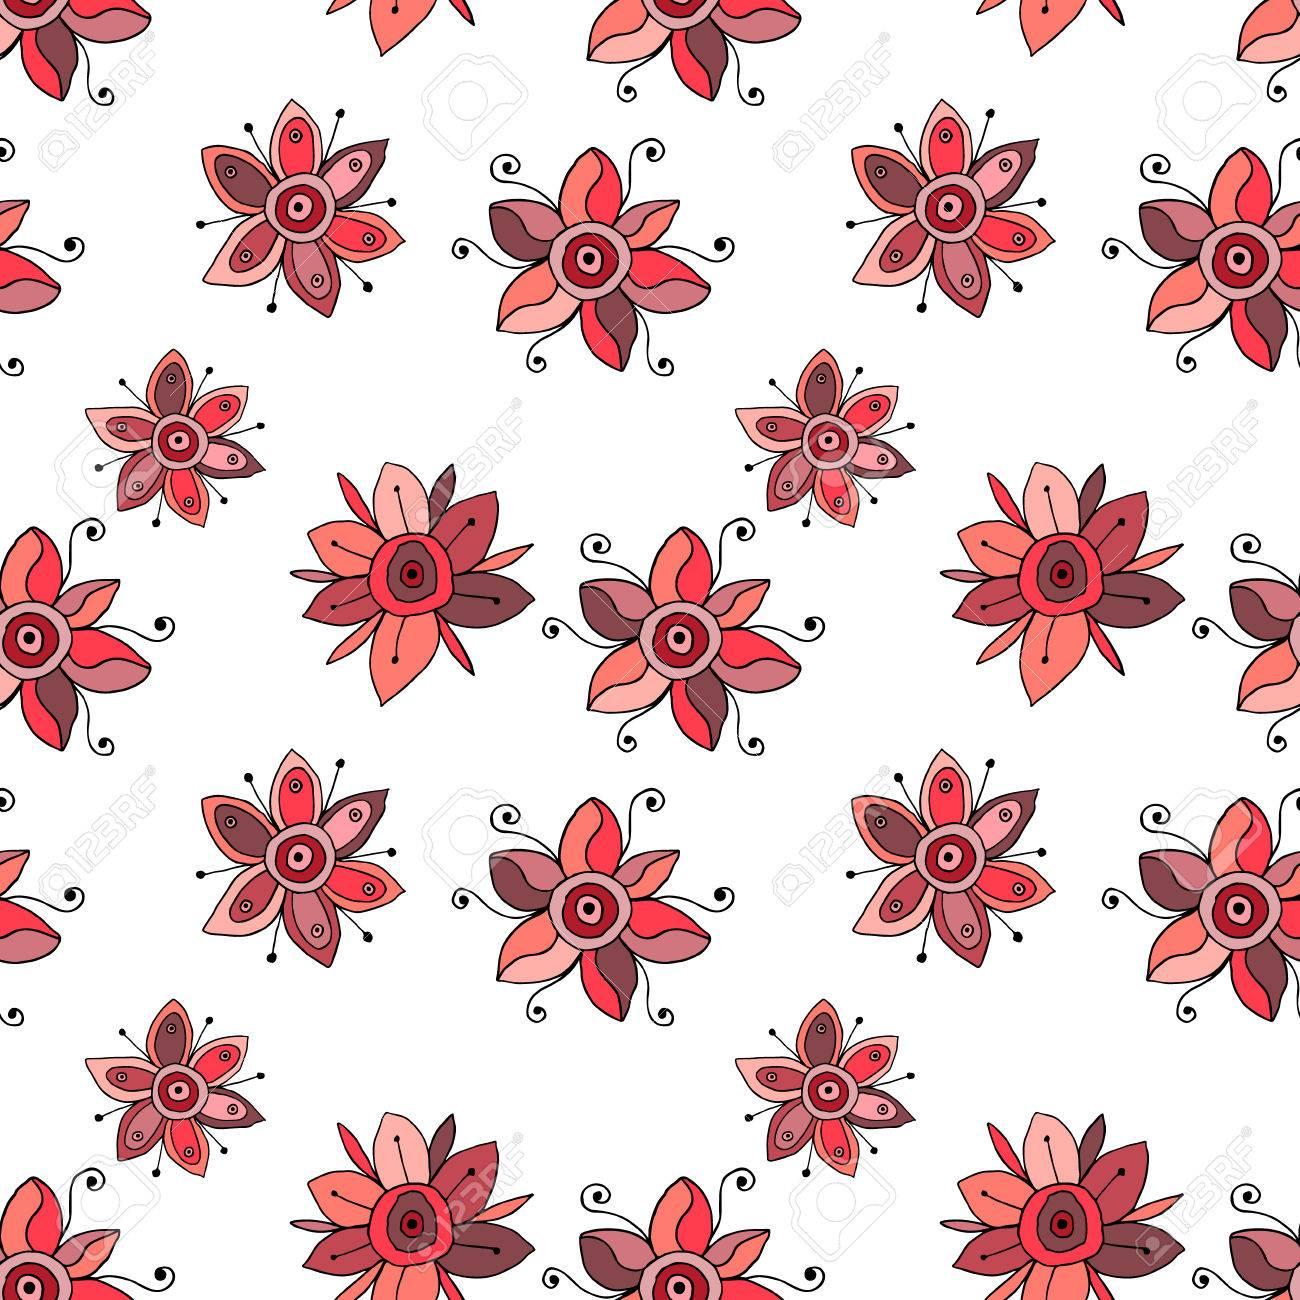 Mano De Vector Sin Fisuras Dibujado Dibujo Infantil Patron Floral